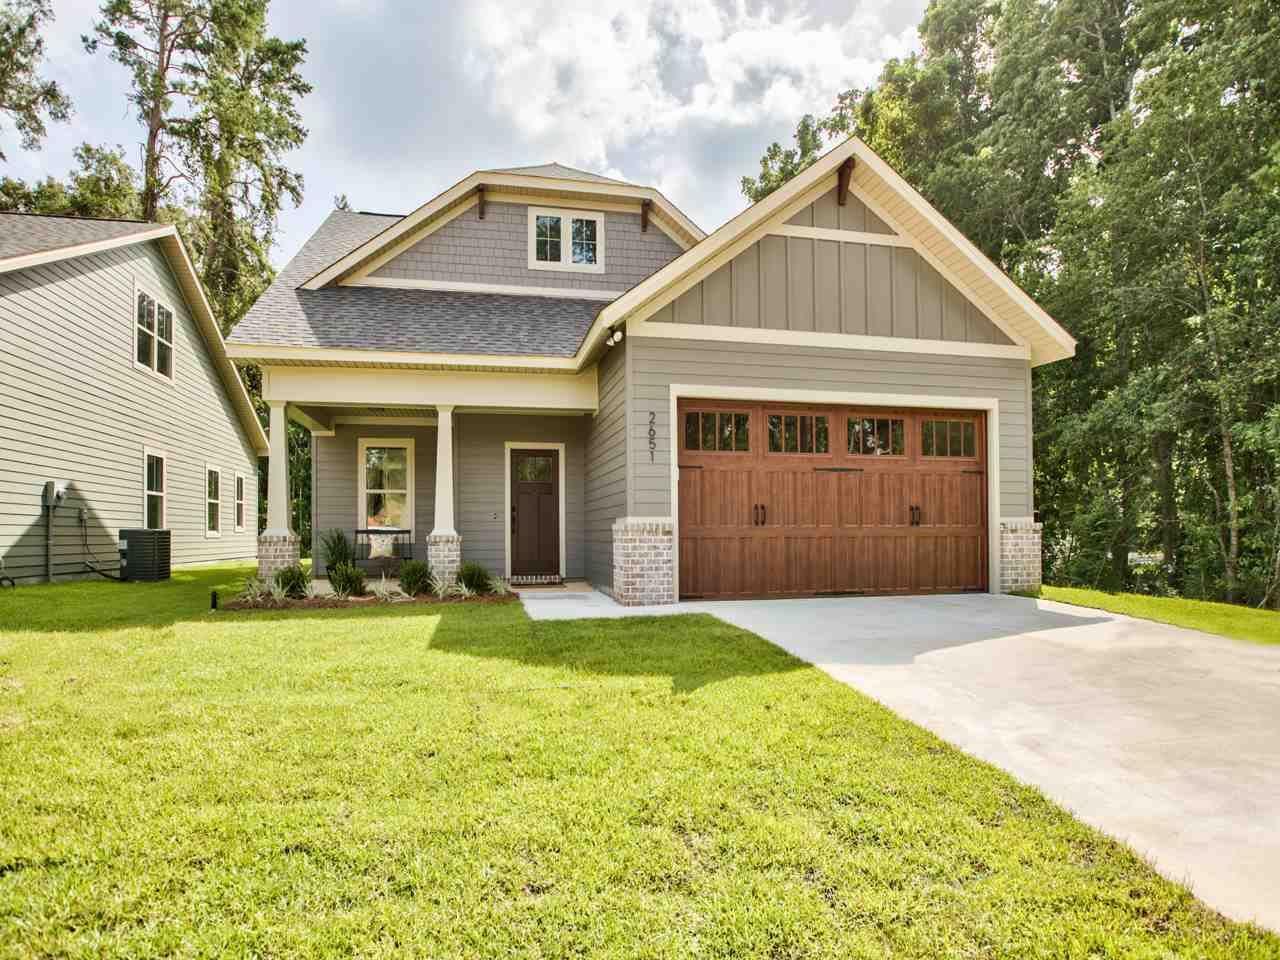 2659 Bending Way, Tallahassee, FL 32308 - MLS#: 326530